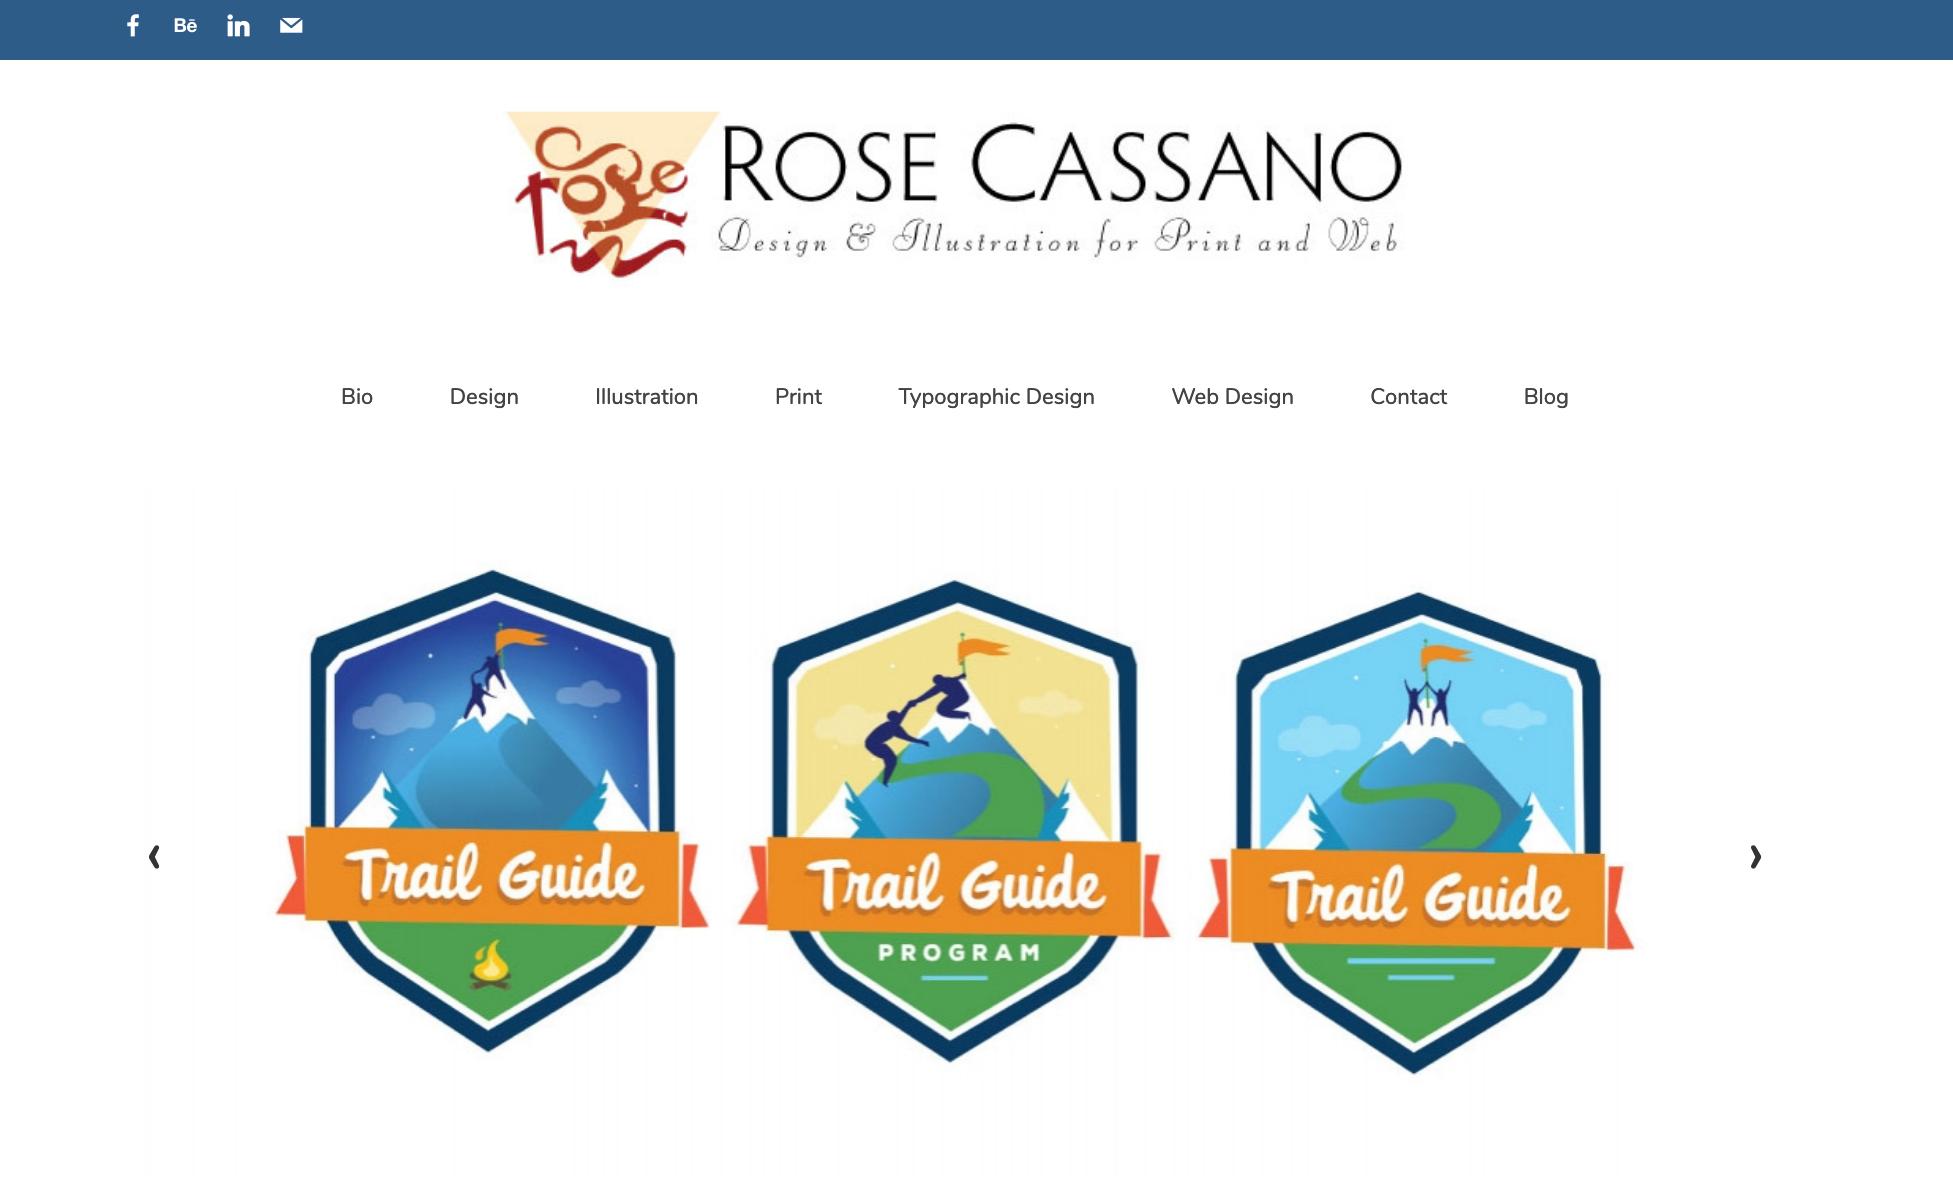 Rose Cassano